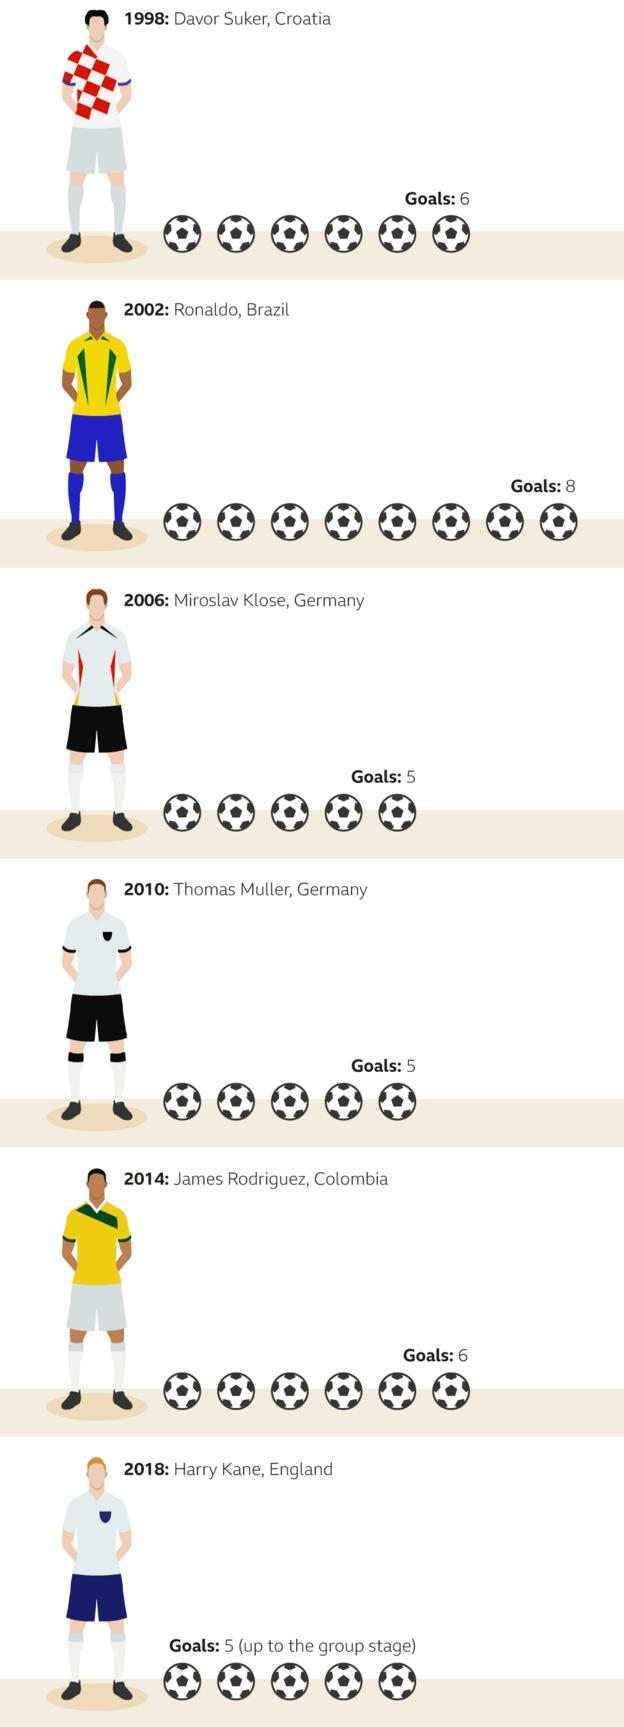 Golden boot winners since 1998 and leading 2018 scorer: 1998 - Davor Suker, Croatia, six goals; 2002 - Ronaldo, Brazil, eight goals; 2006 - Miroslav Klose, Germany, six goals; 2010 - Thomas Muller, Germany, five goals; 2014 - James Rodriguez, Colombia, six goals; 2018 - Harry Kane, England, five goals so far